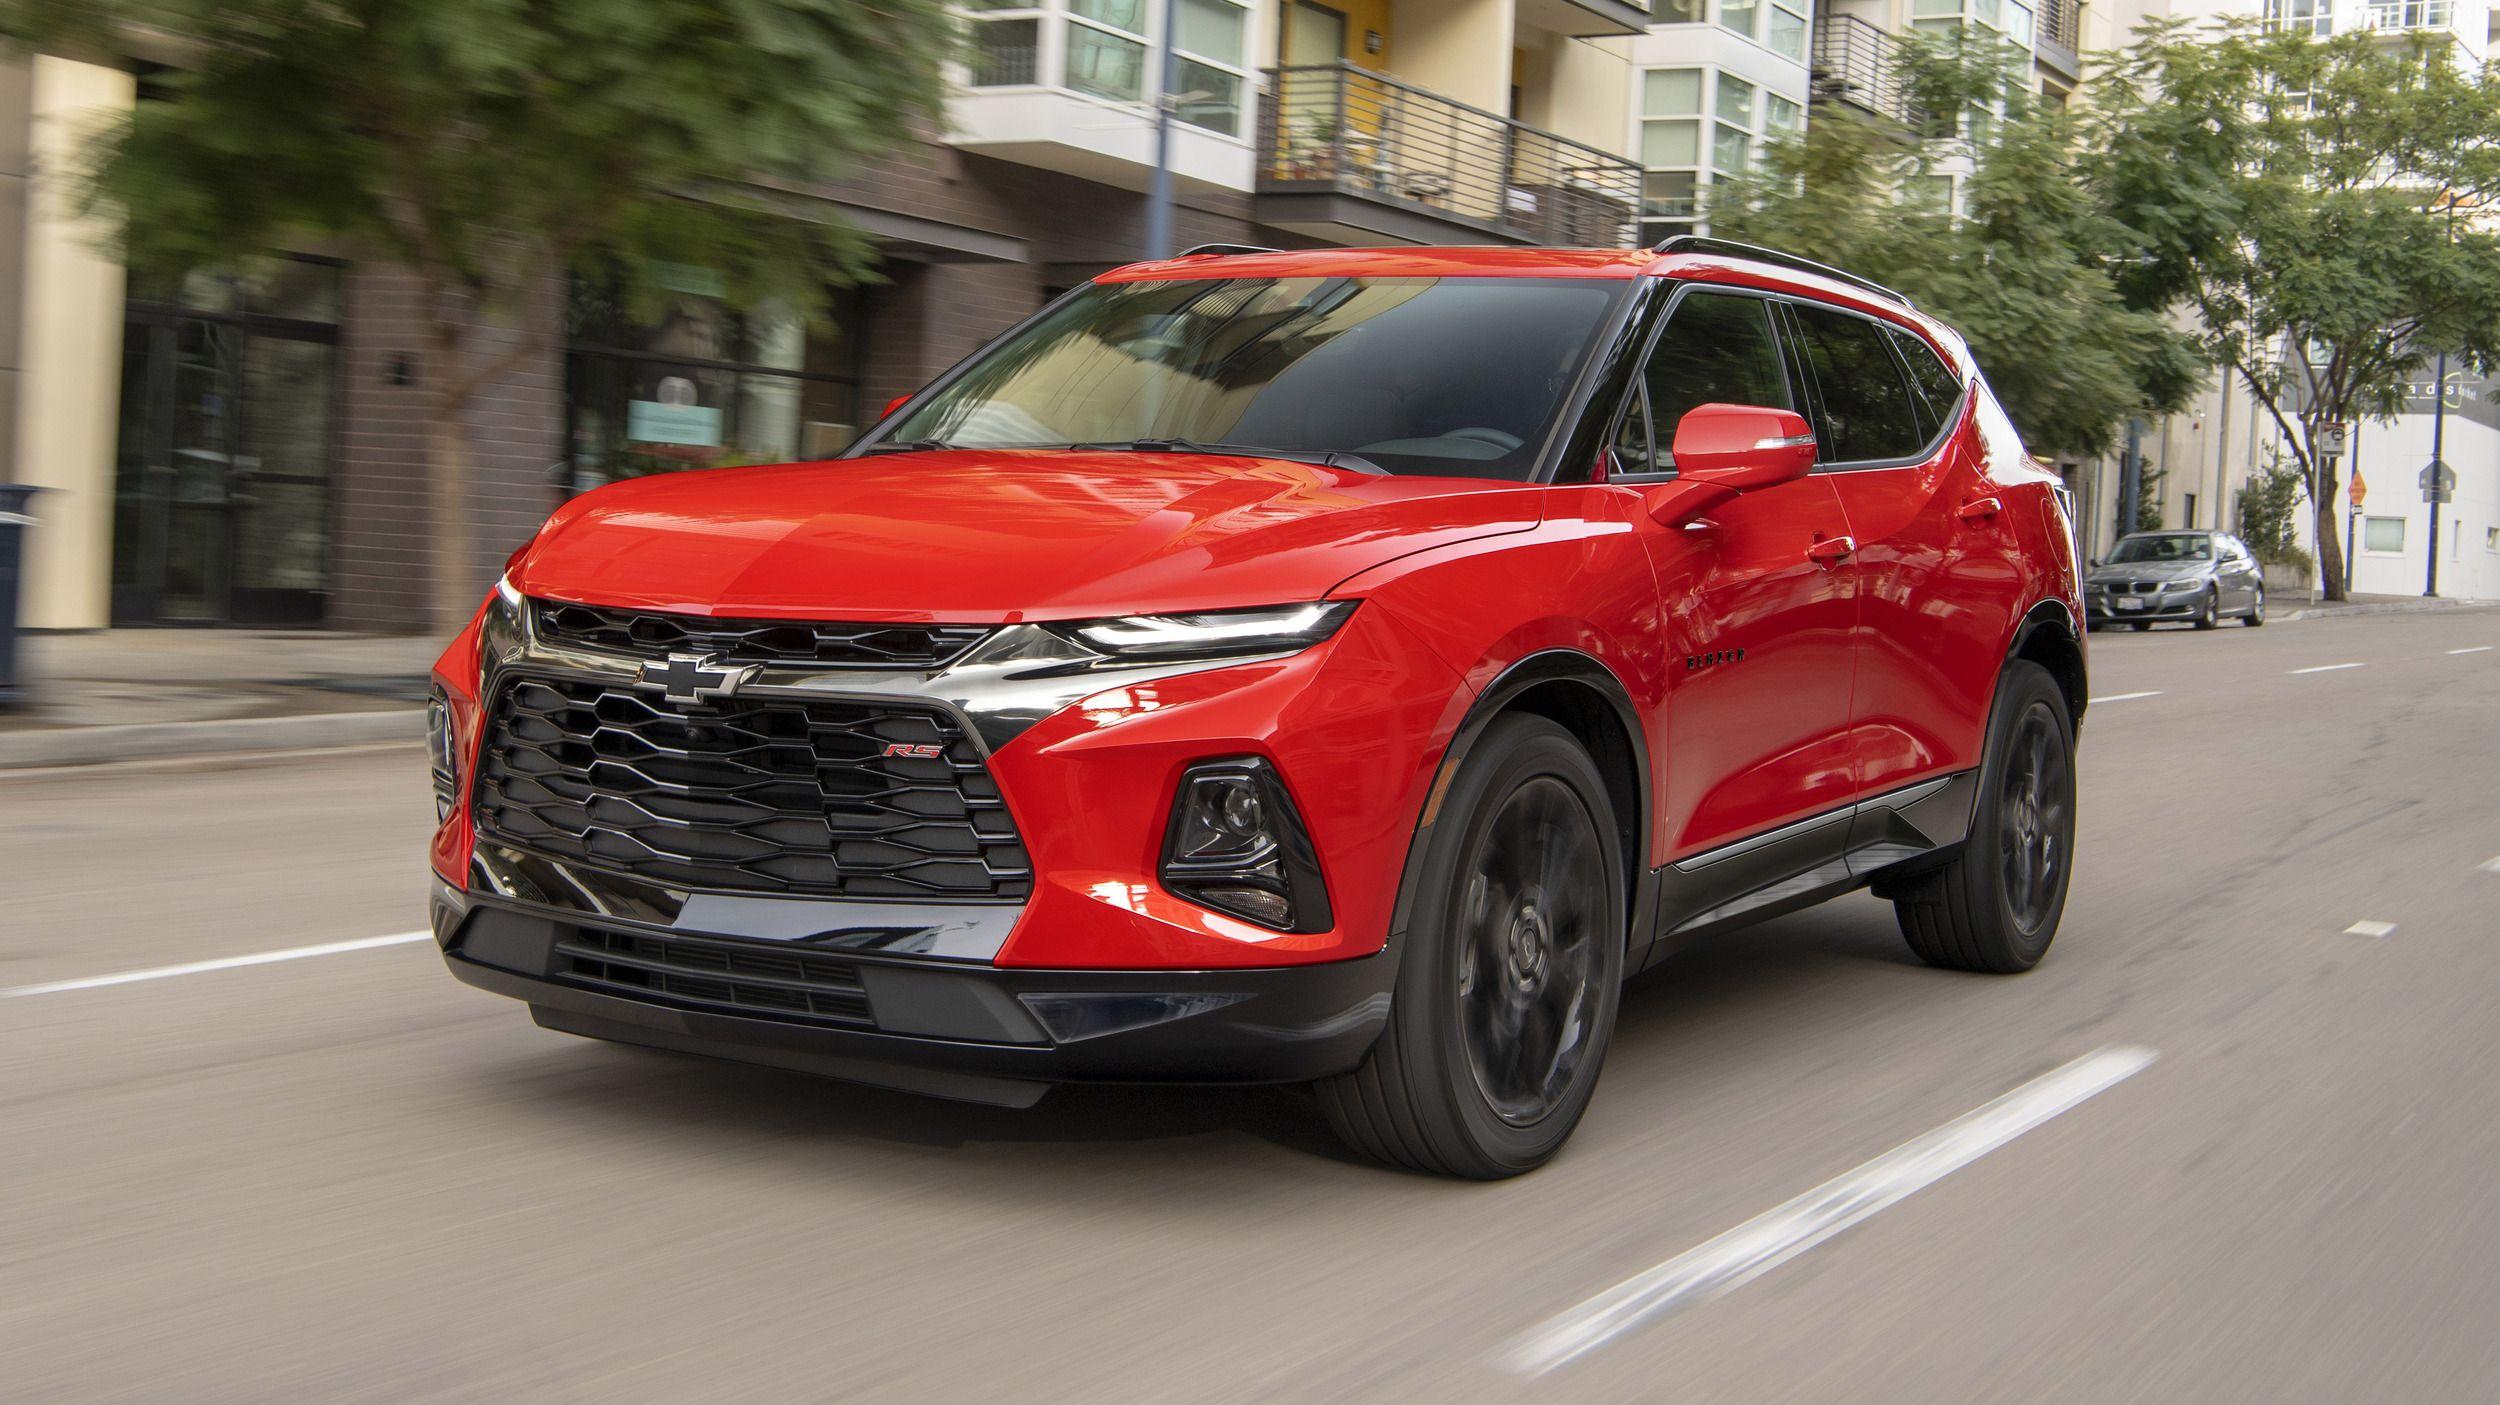 2020 Chevy Trailblazer Ss Release Date